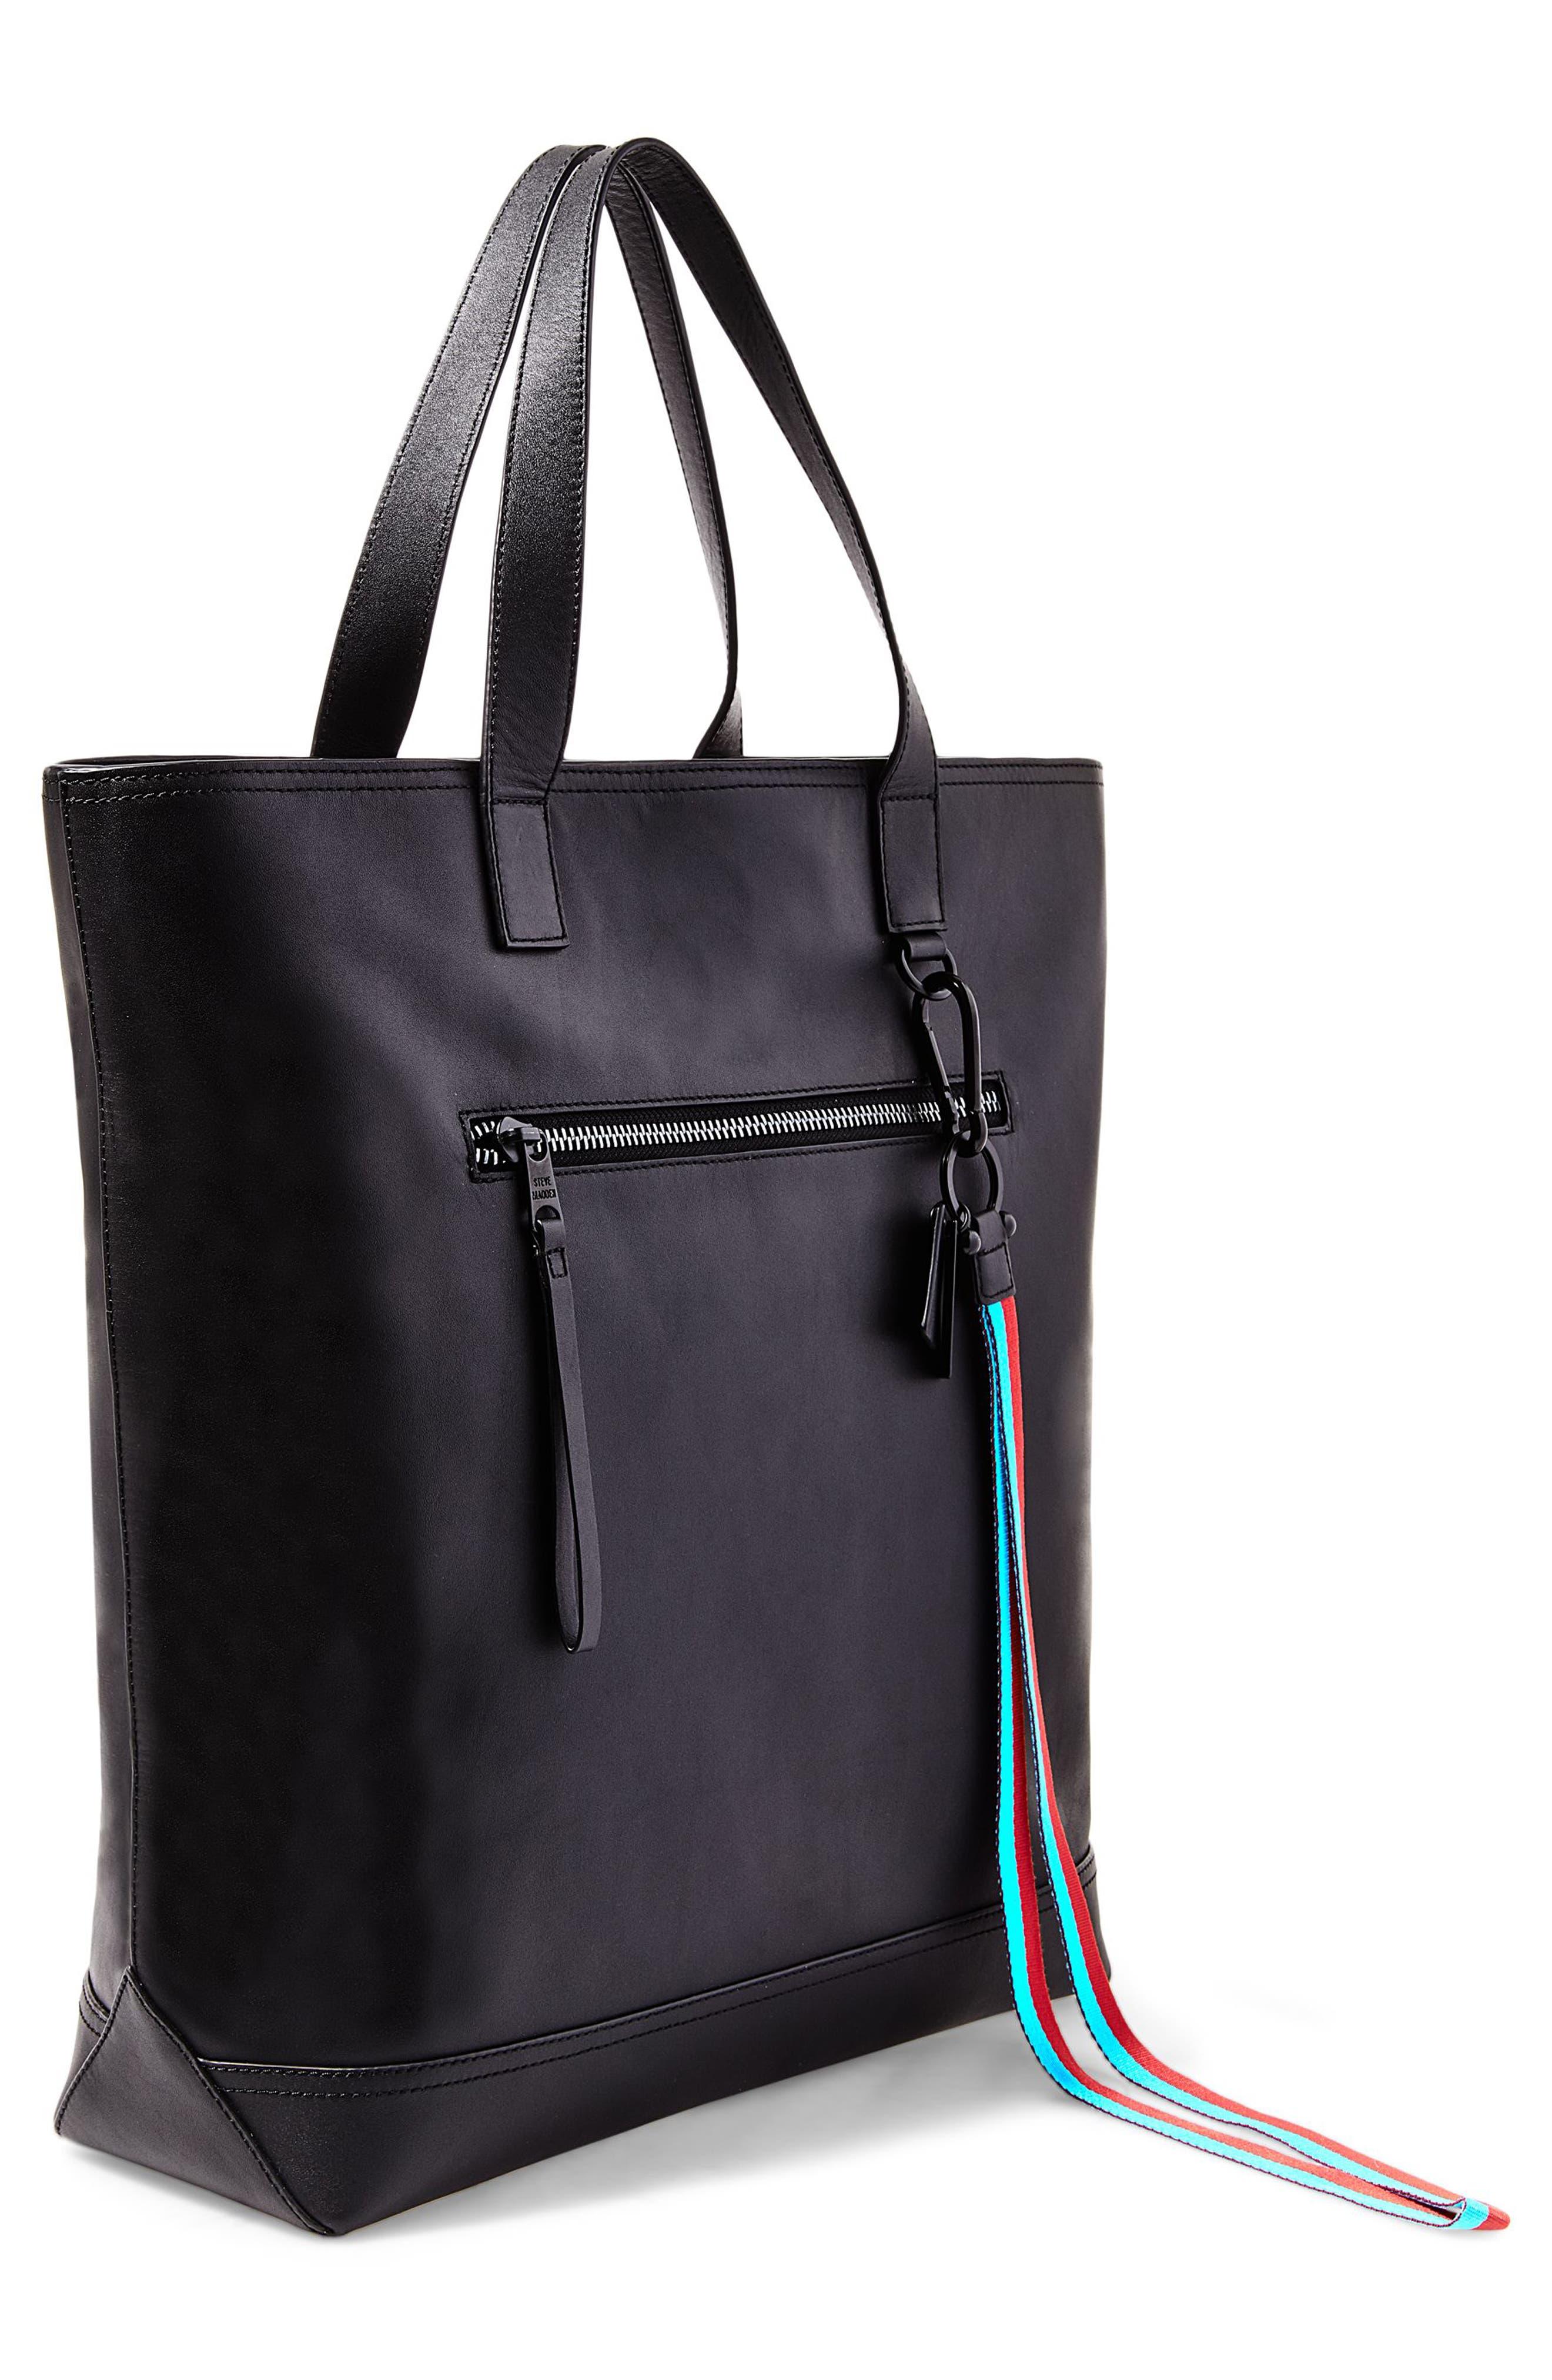 GQ x Steve Madden Leather Tote Bag,                             Alternate thumbnail 2, color,